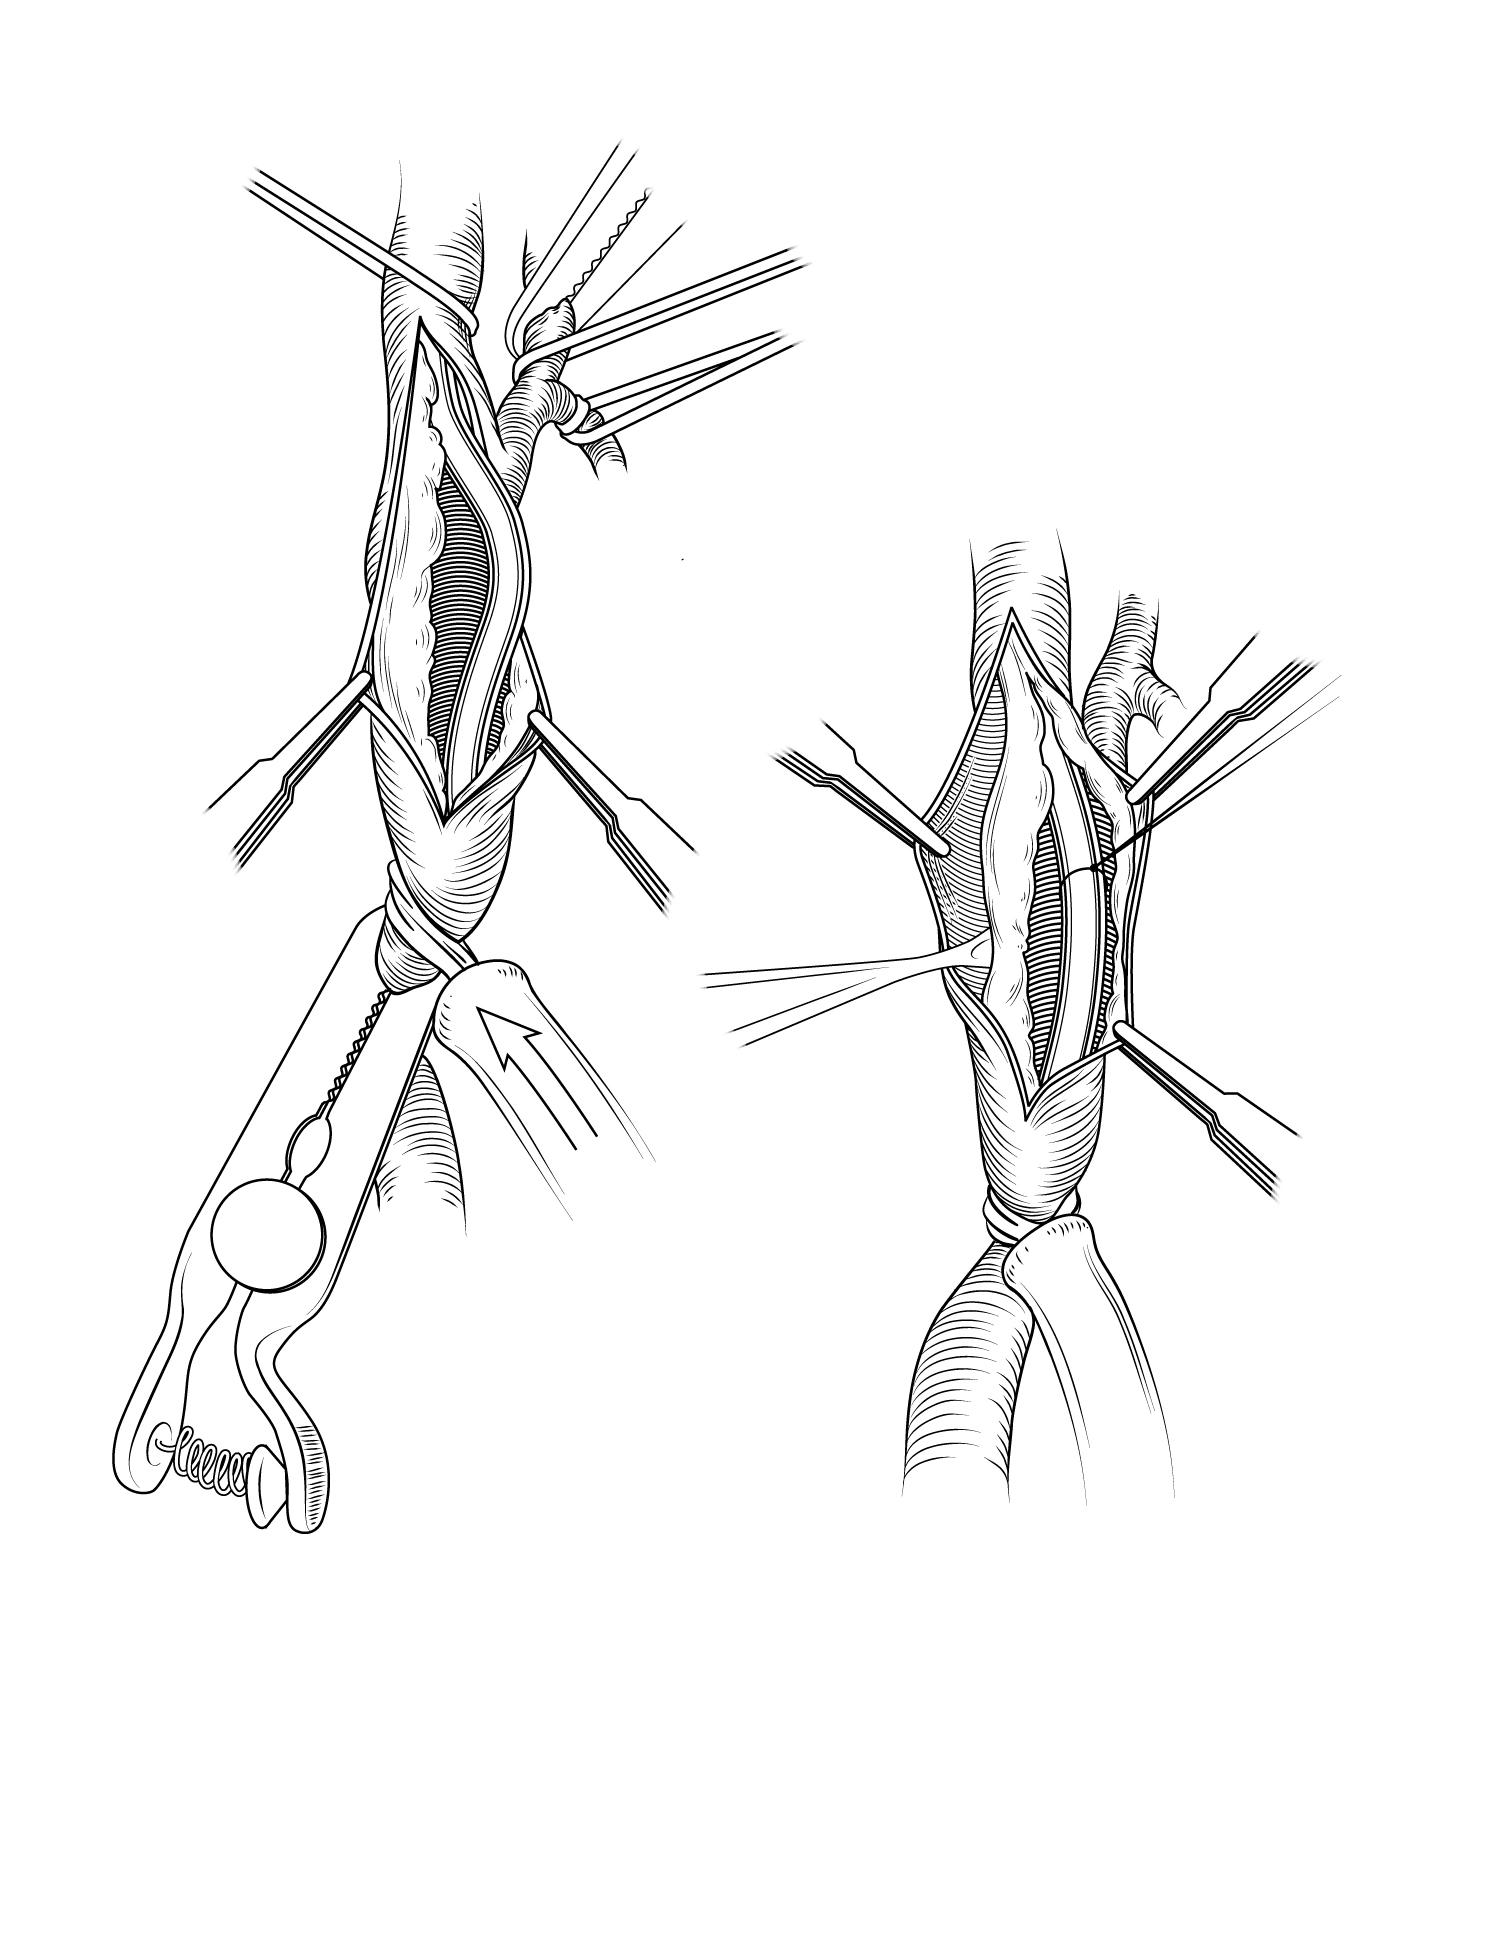 Carotid endarterectomy.